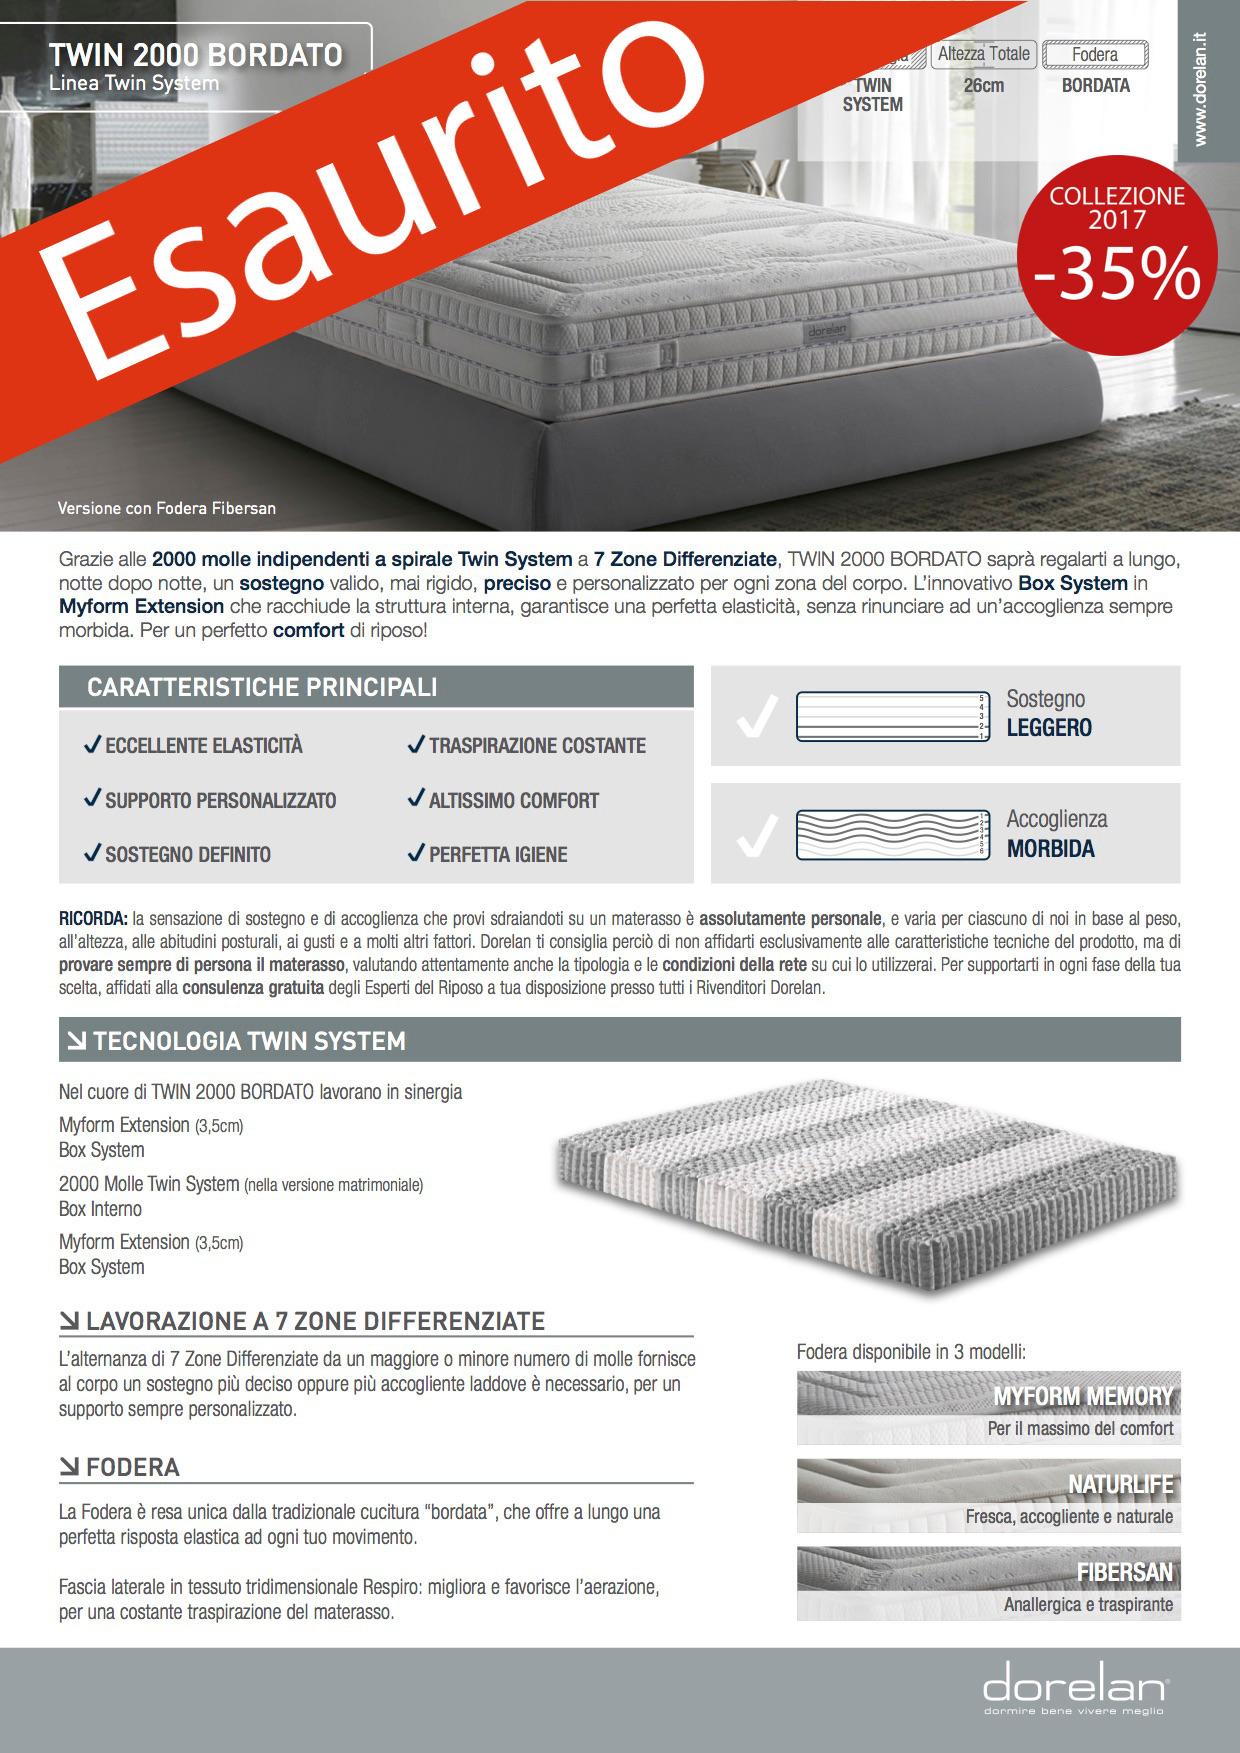 MATERASSI DORELAN TWIN 2000 BO NaturLife Firm 80×190